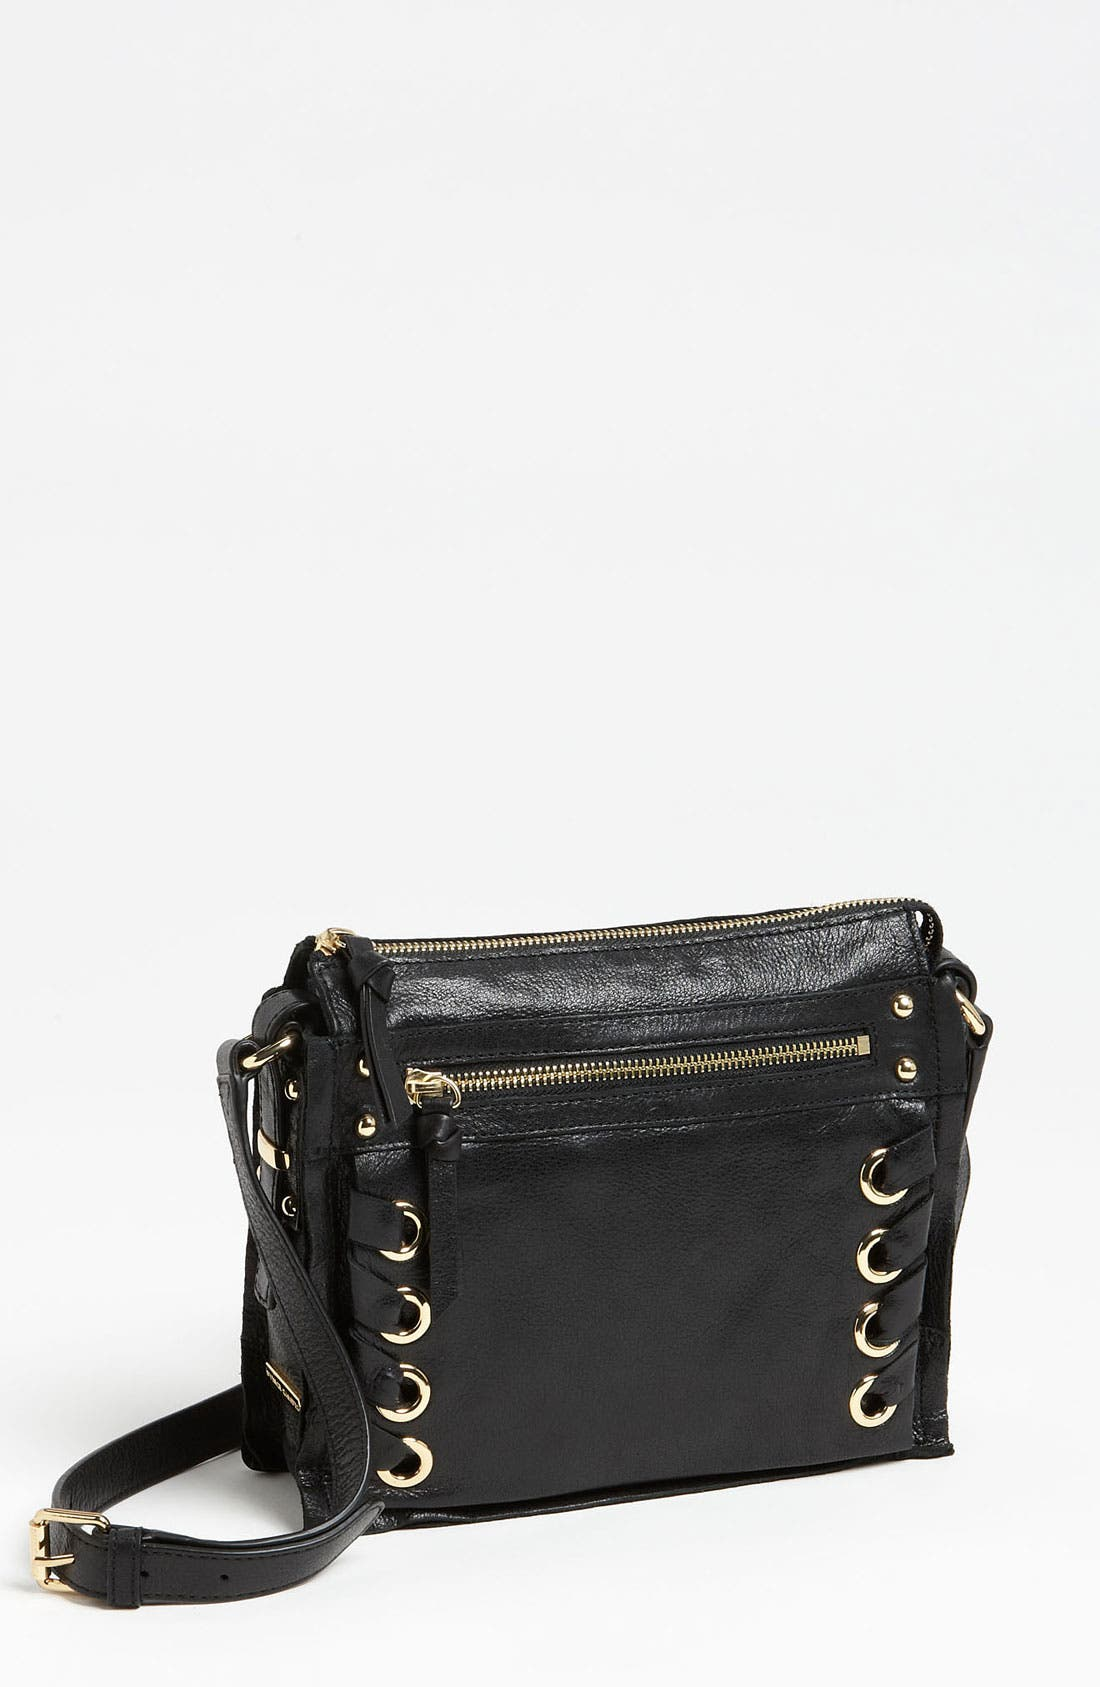 Alternate Image 1 Selected - Vince Camuto 'Mica' Crossbody Bag